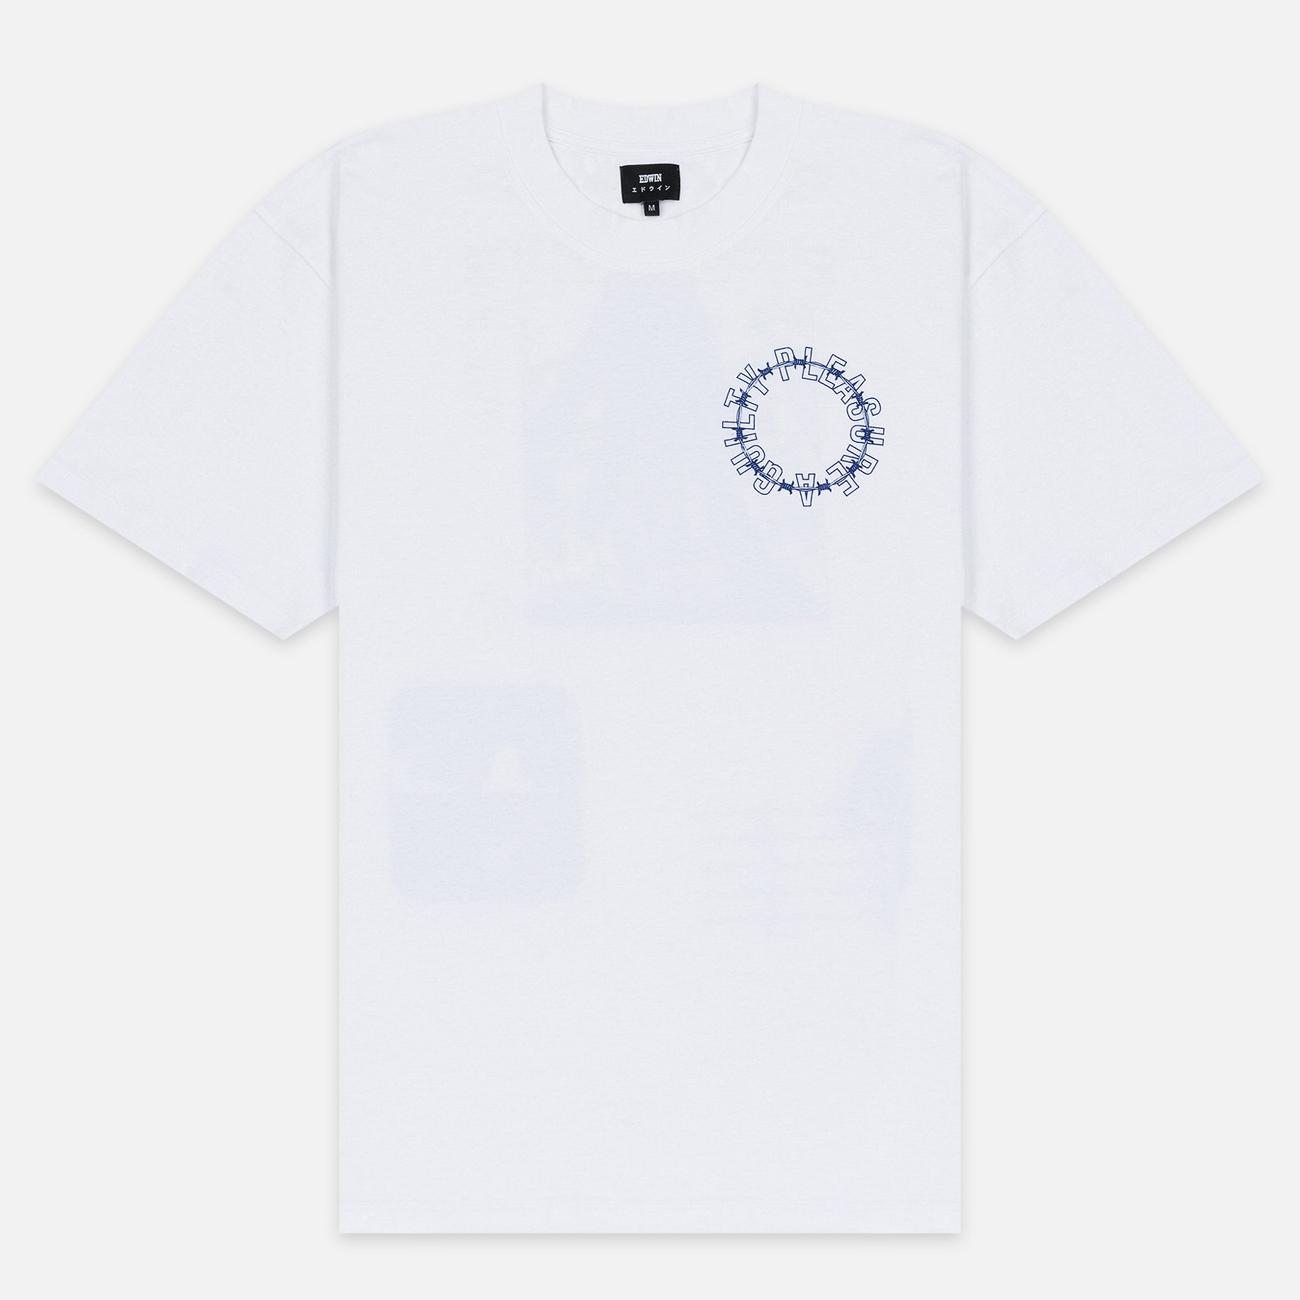 Мужская футболка Edwin Altered Fantasy Garment Wash White